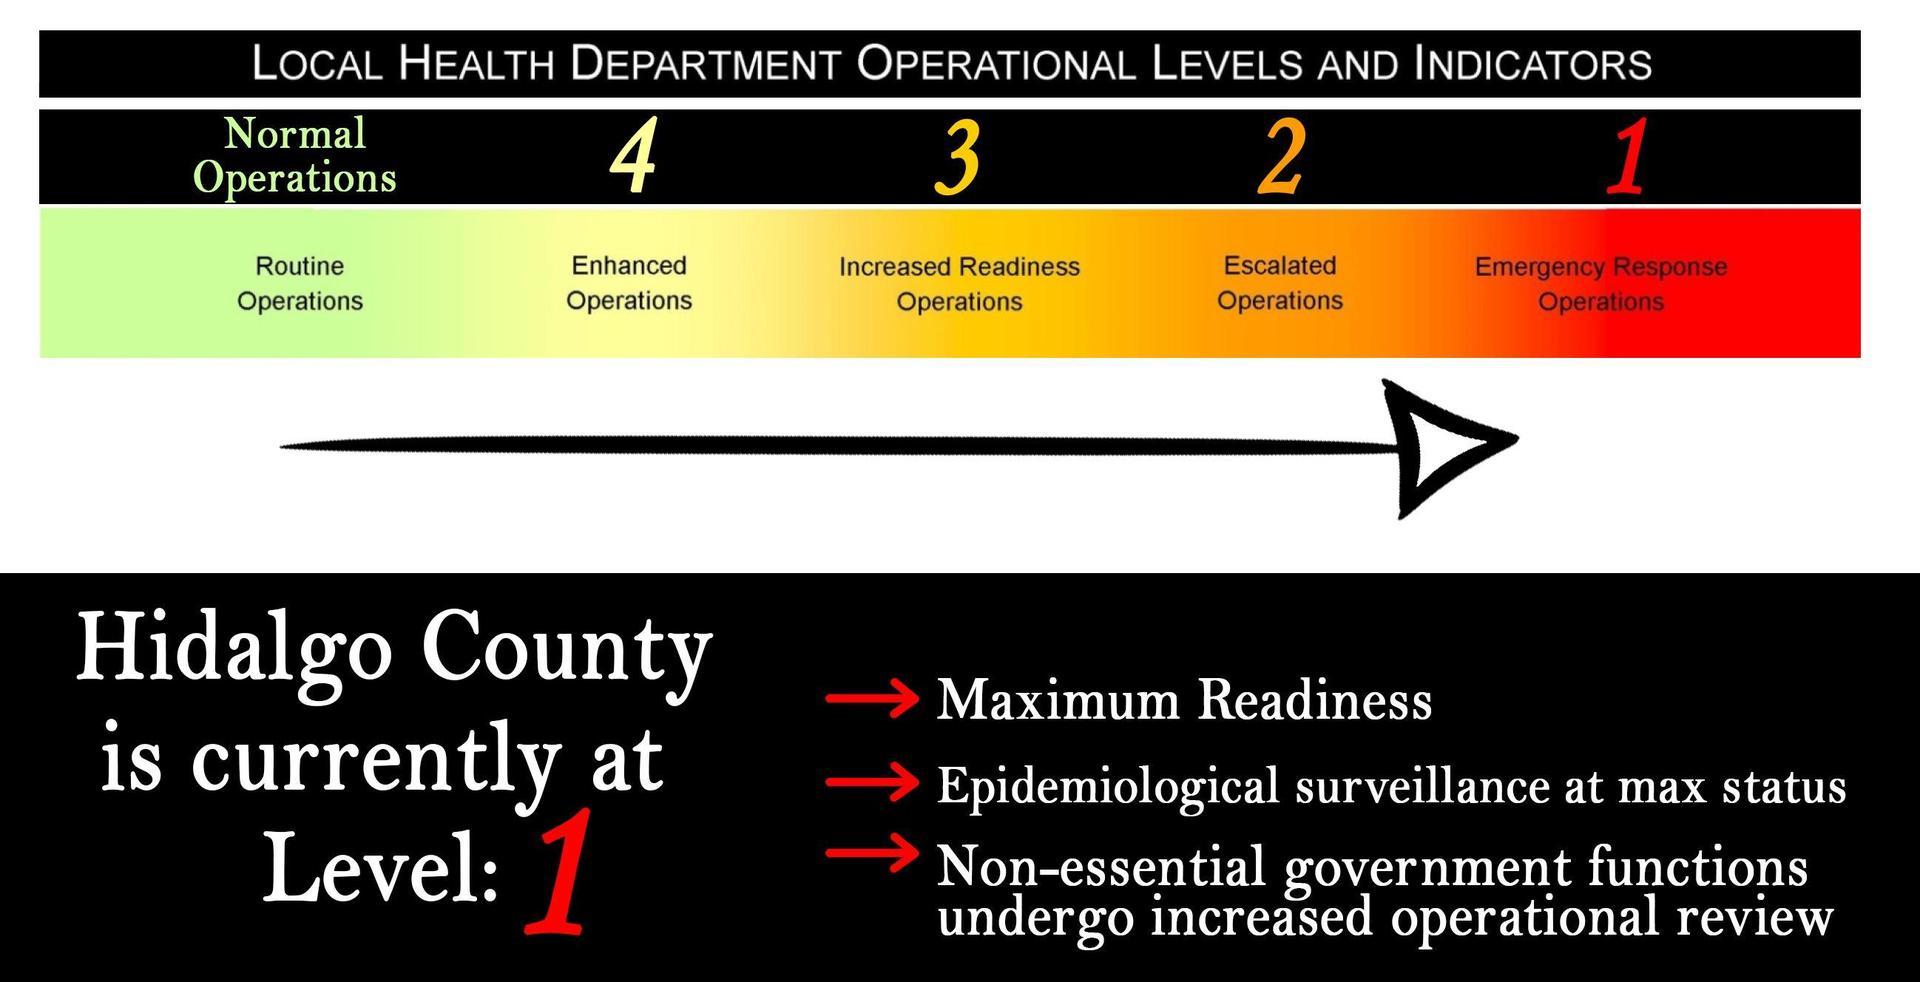 Hidalgo County COVID-19 Levels